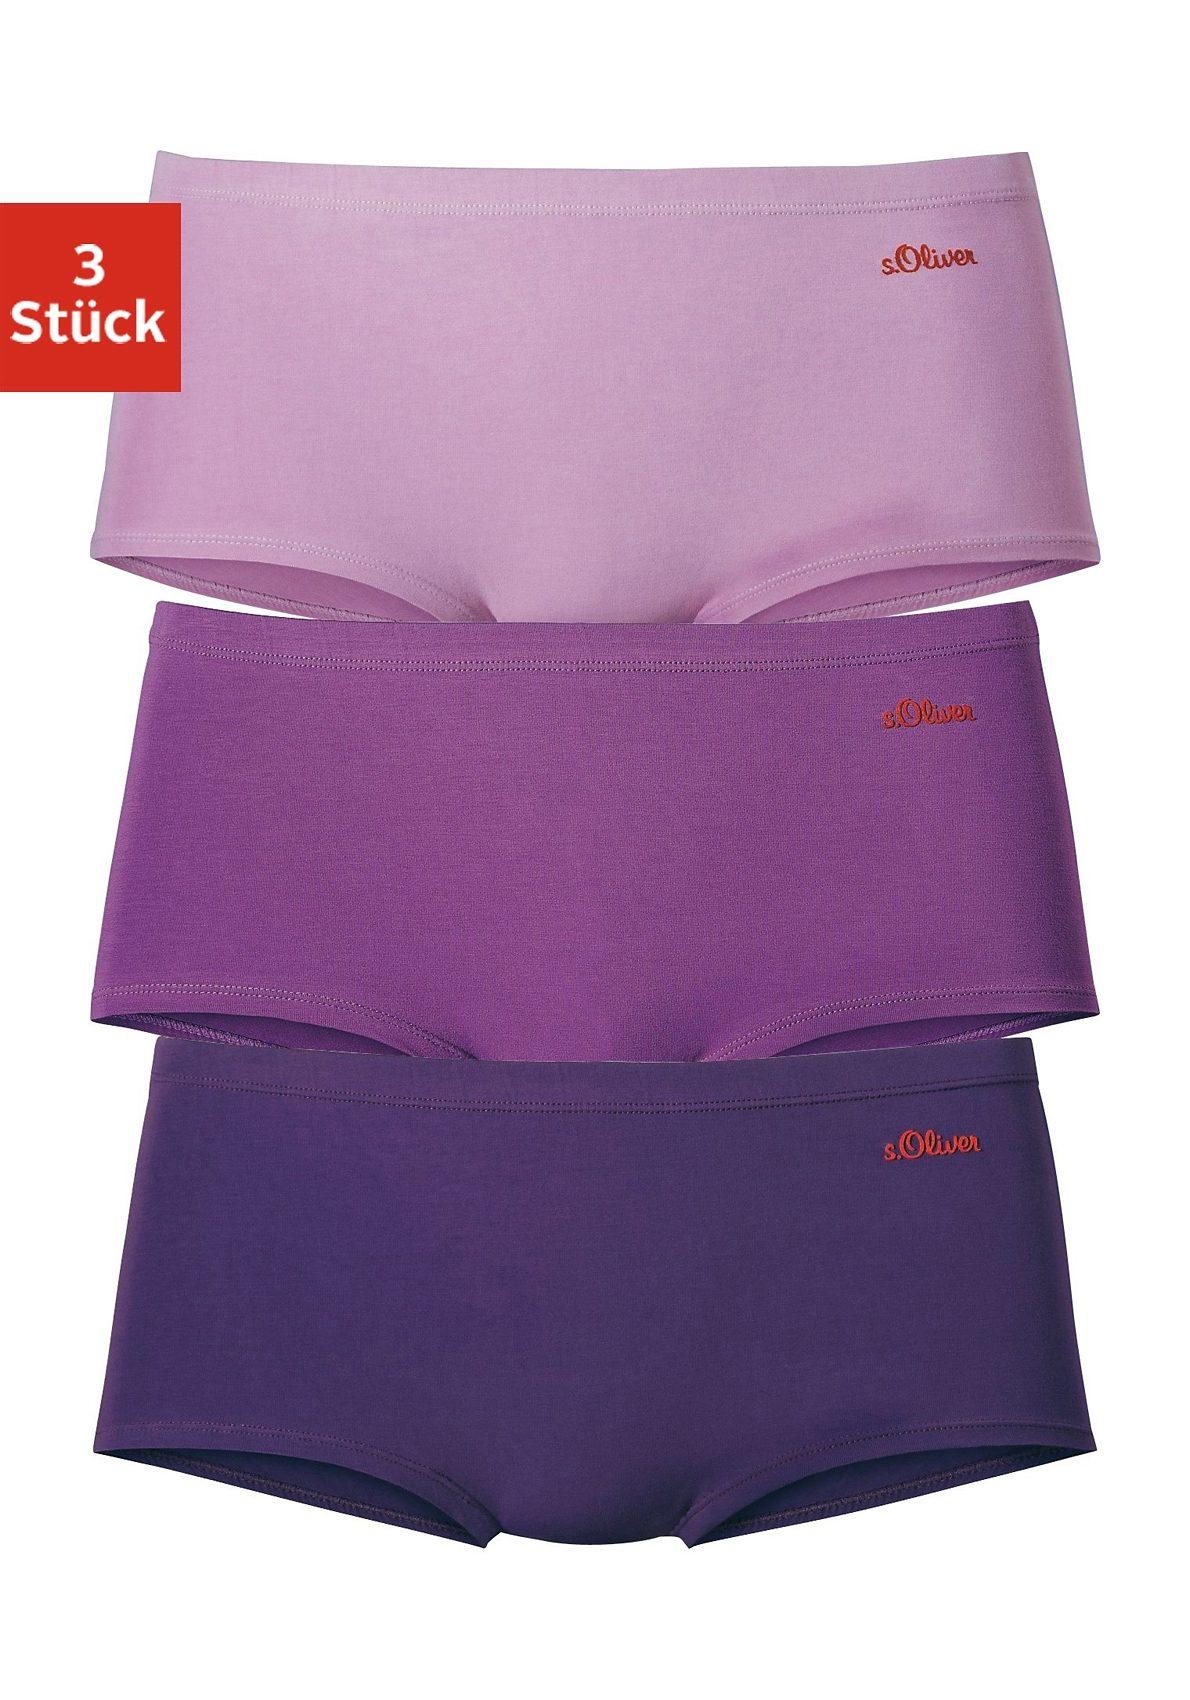 s.Oliver RED LABEL Bodywear klassische Baumwoll-Panties (3 Stück)